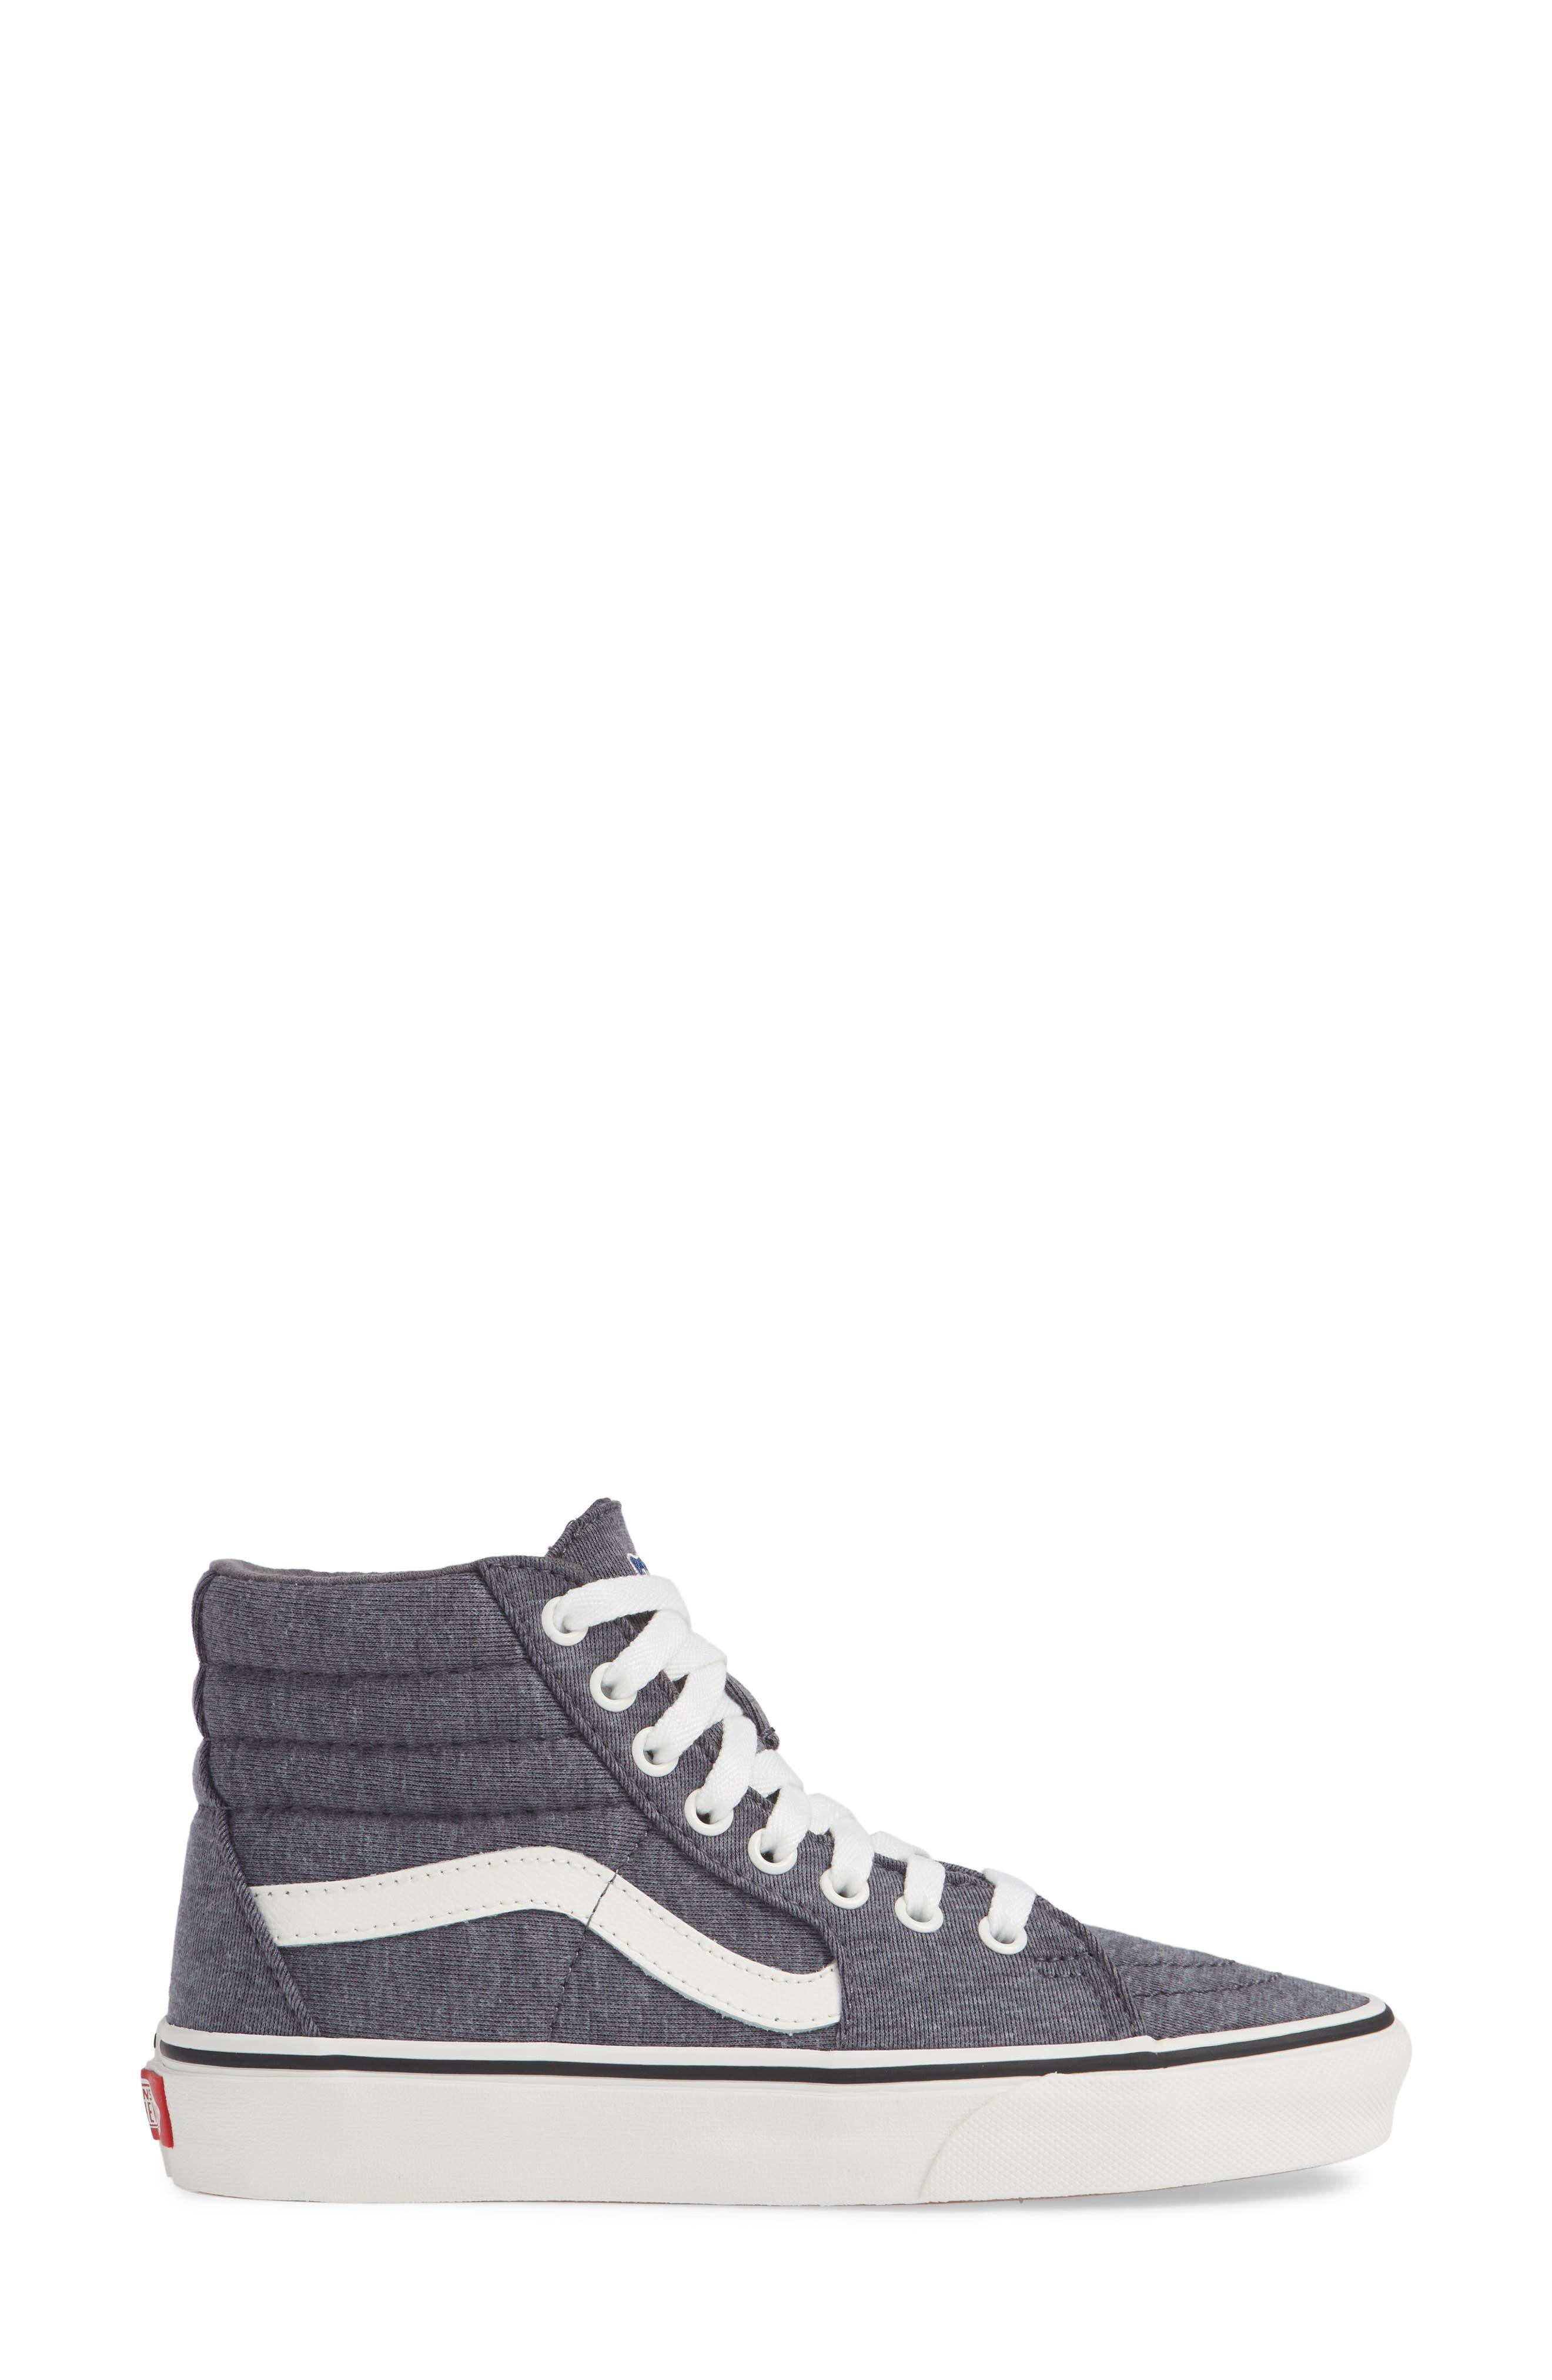 'Sk8-Hi' Sneaker,                             Alternate thumbnail 3, color,                             GREY/ SNOW WHITE